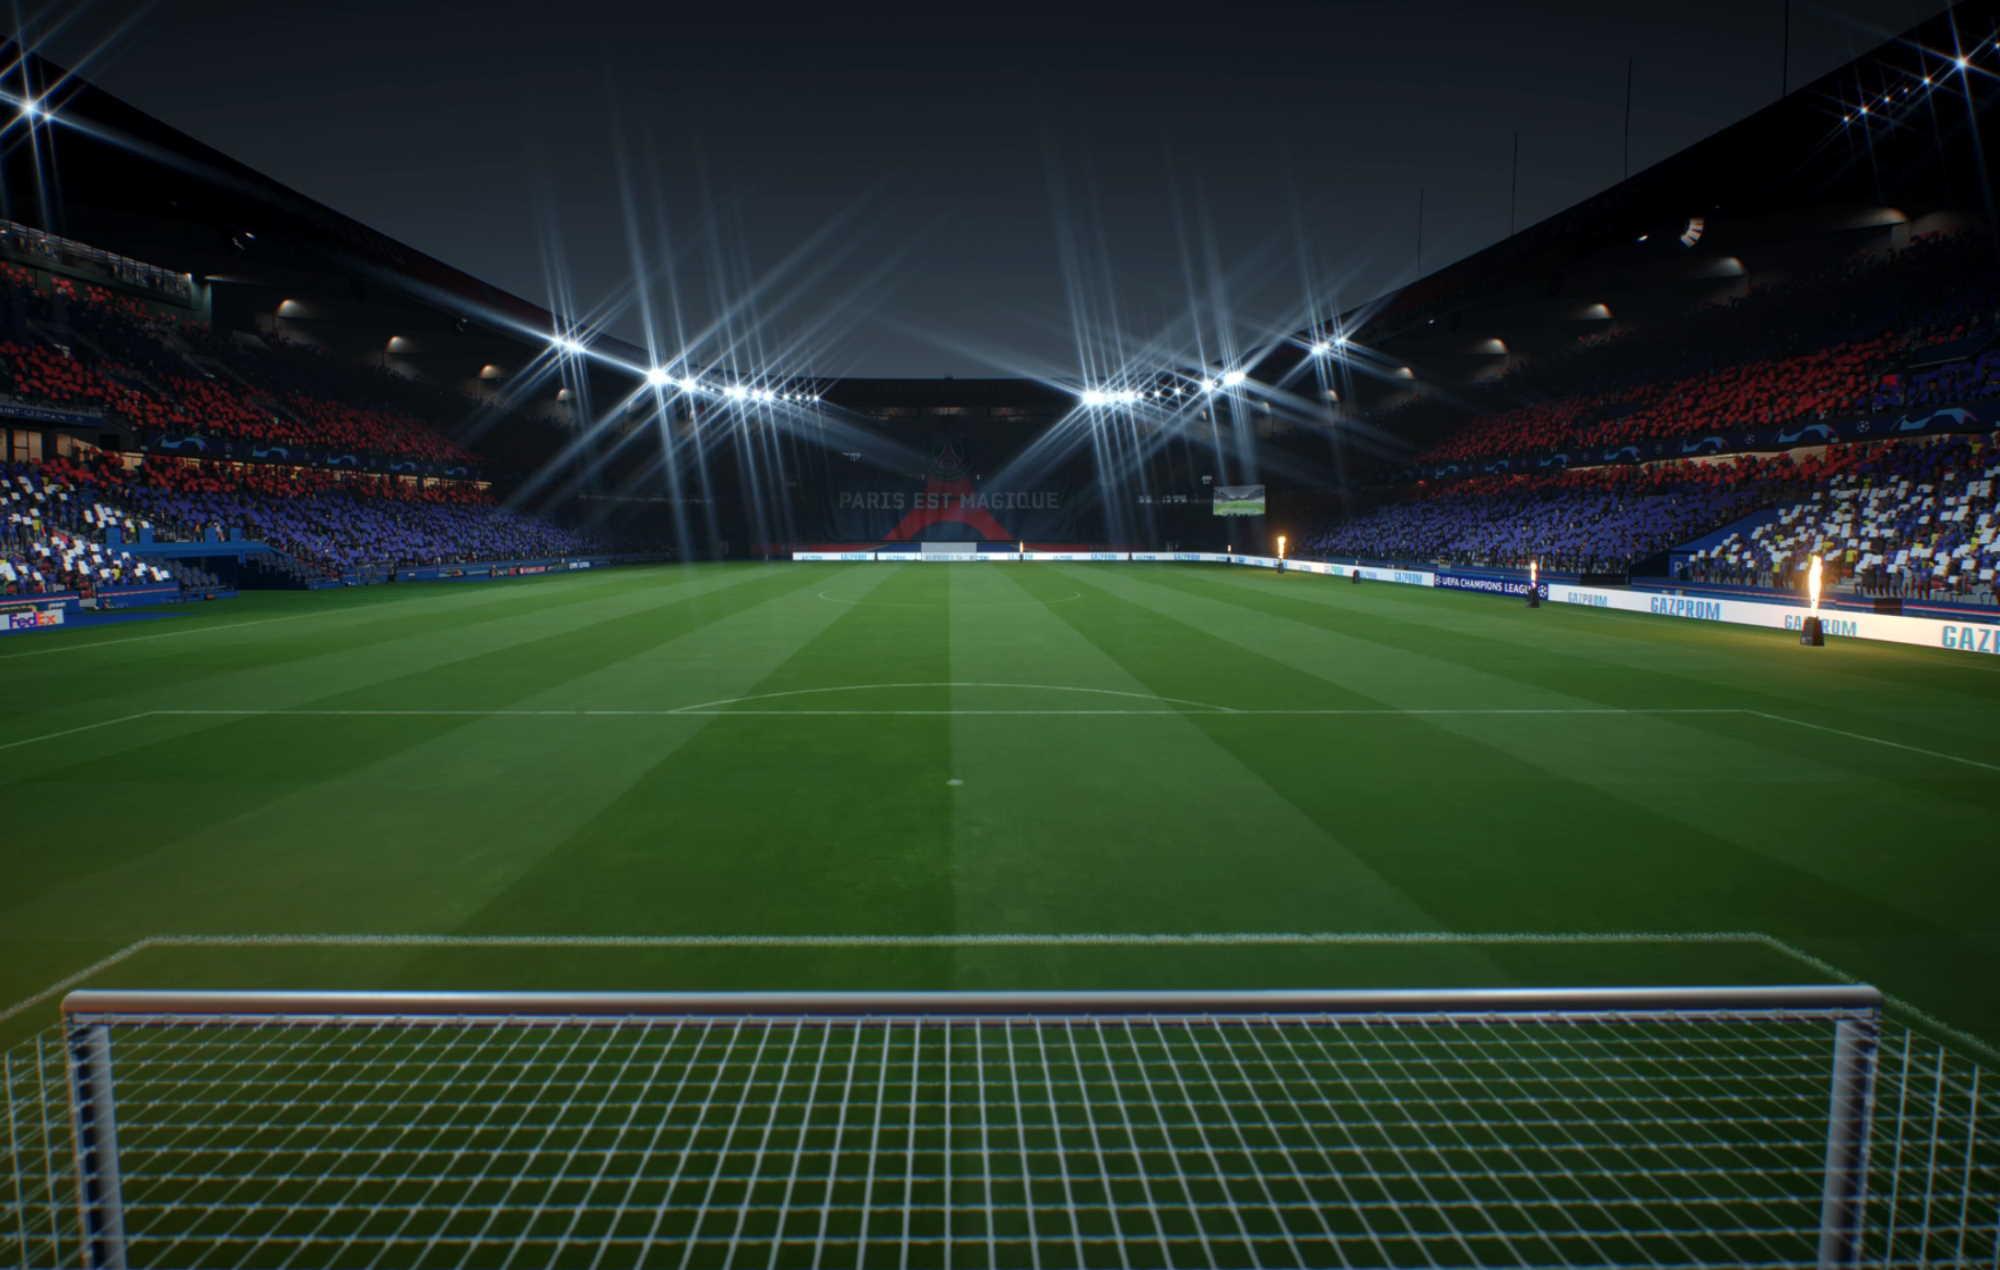 FIFA 22 PSG Stadium